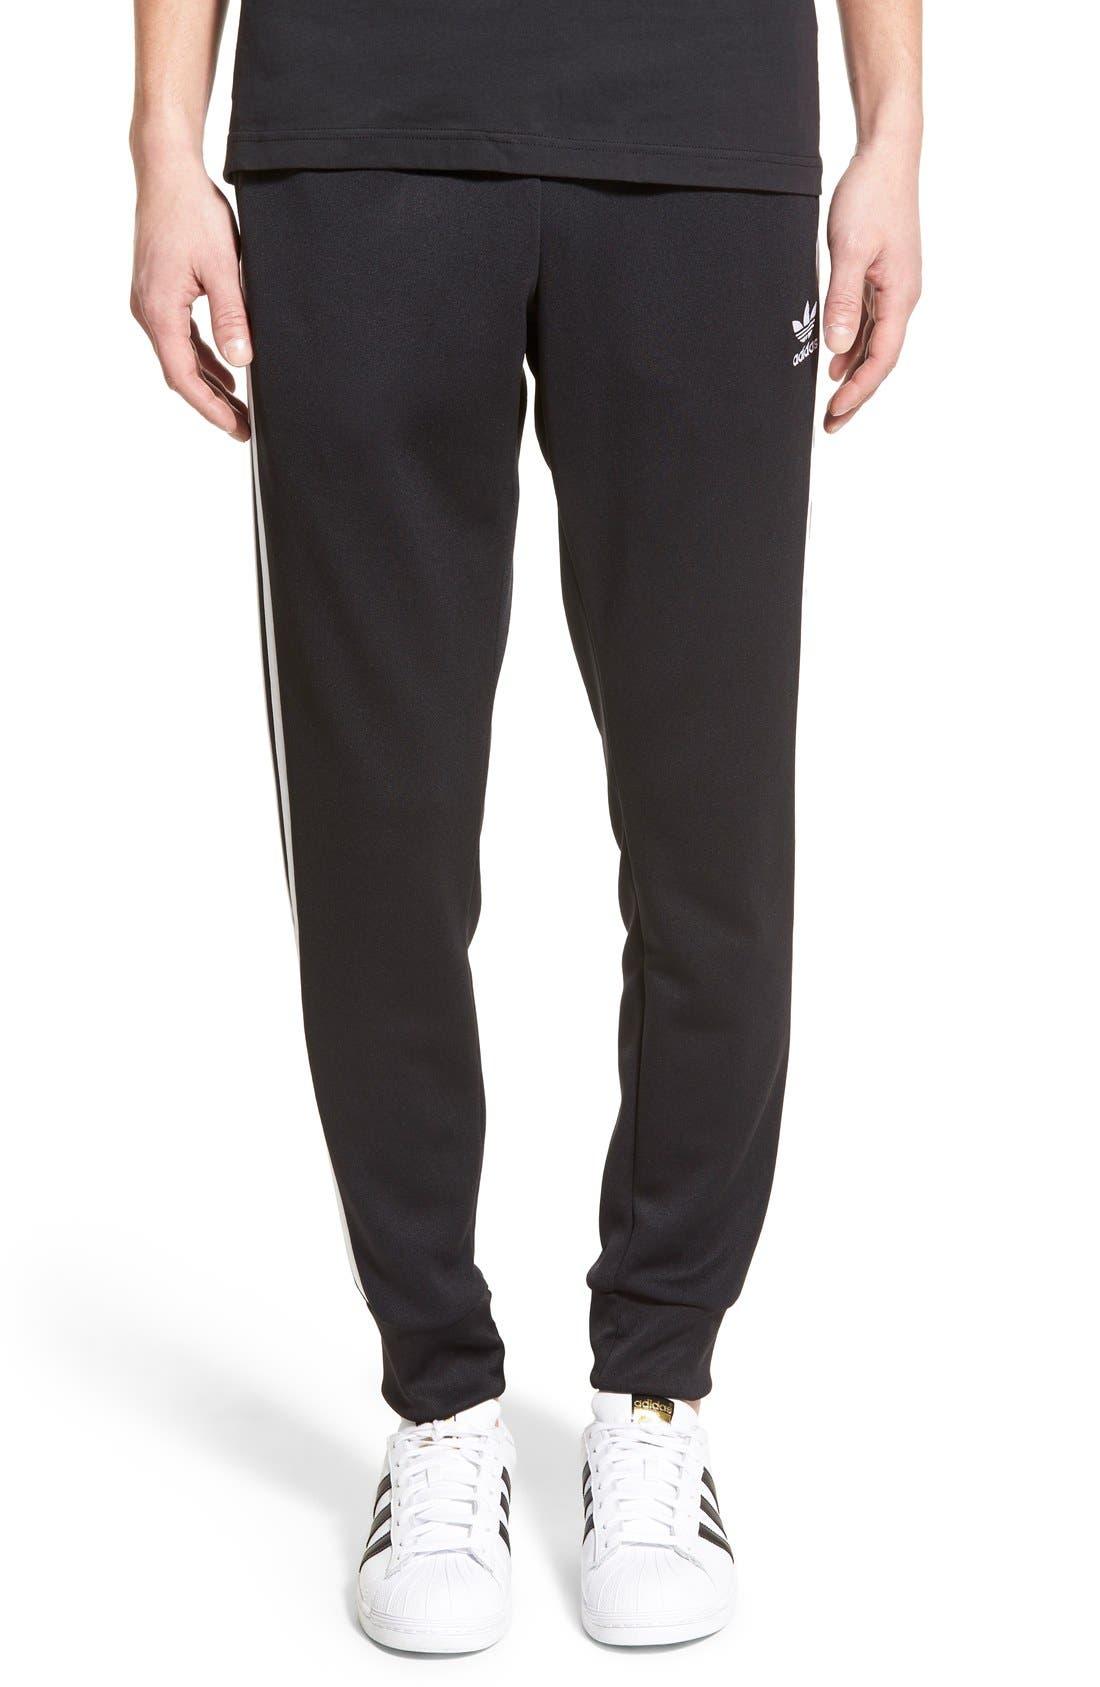 Main Image - adidas Originals 'Superstar' Track Pants